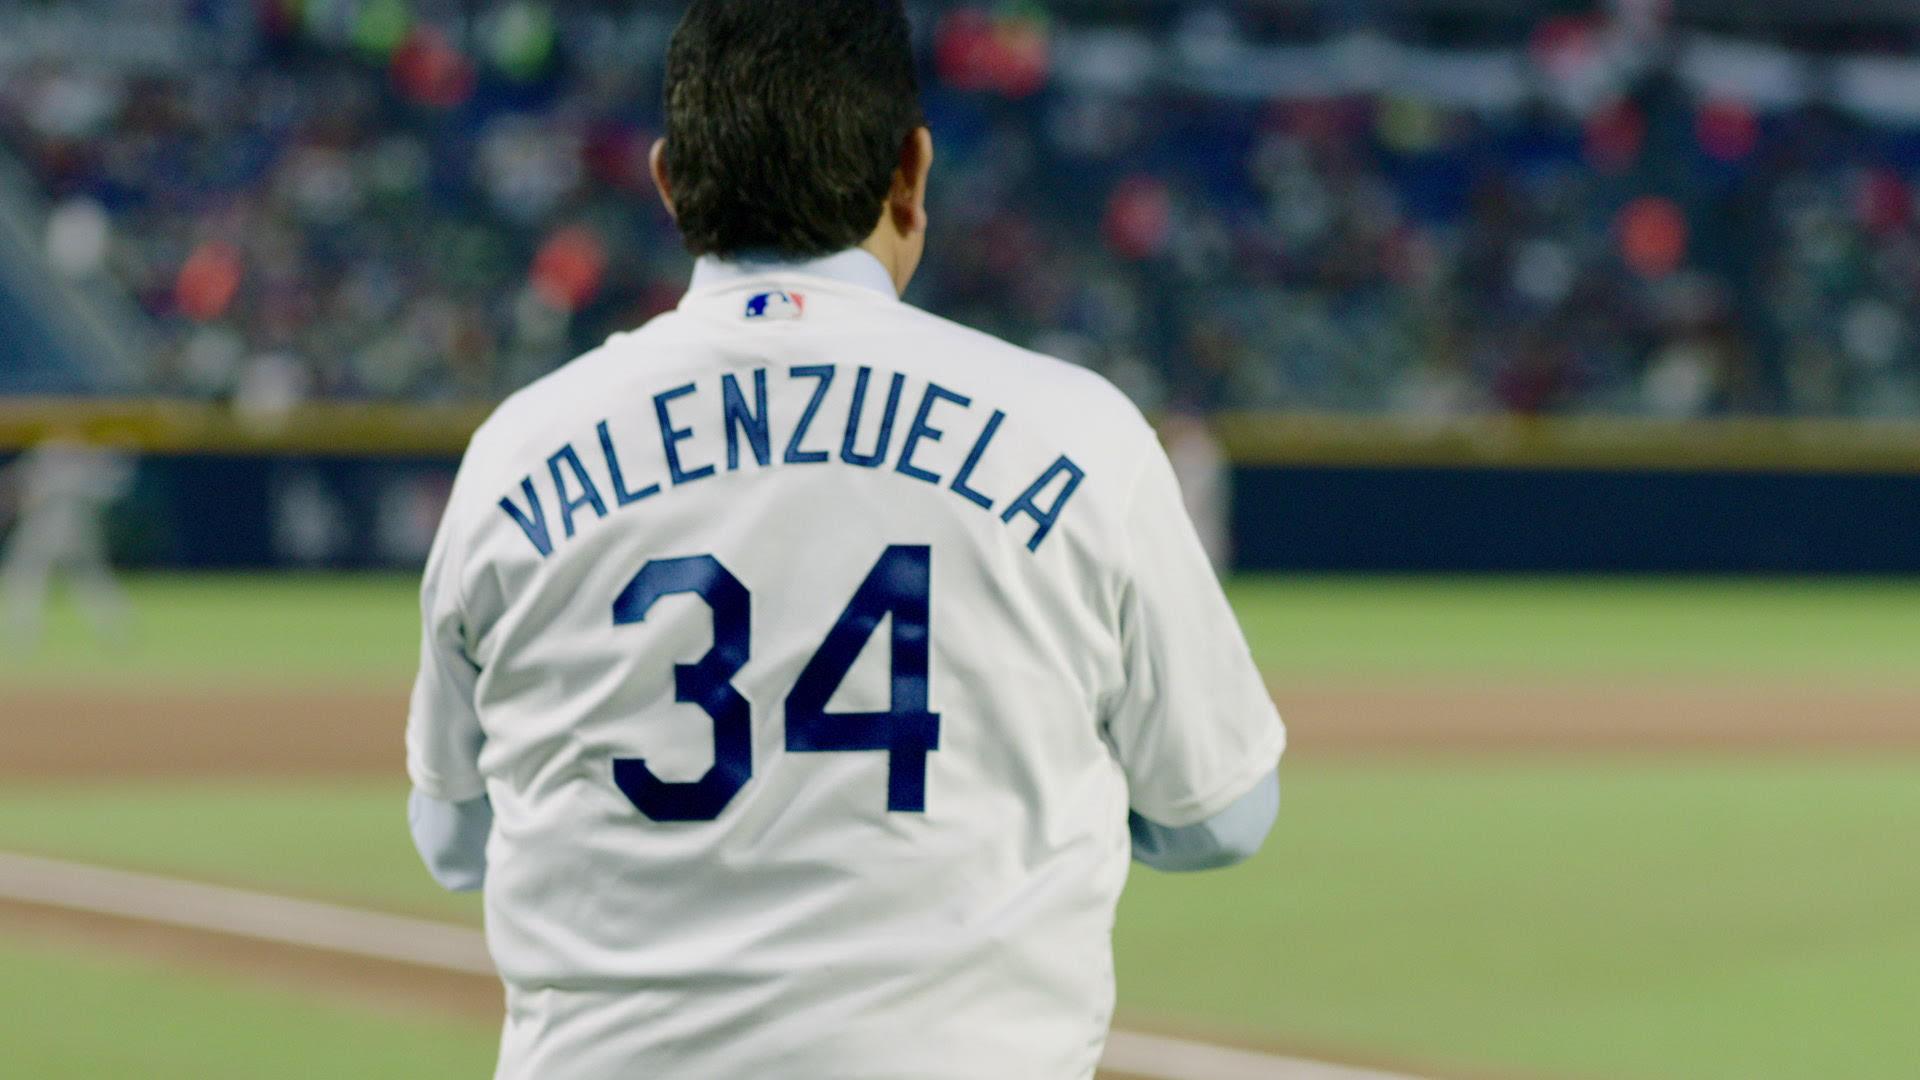 MLB_Thumbnail_1.jpg